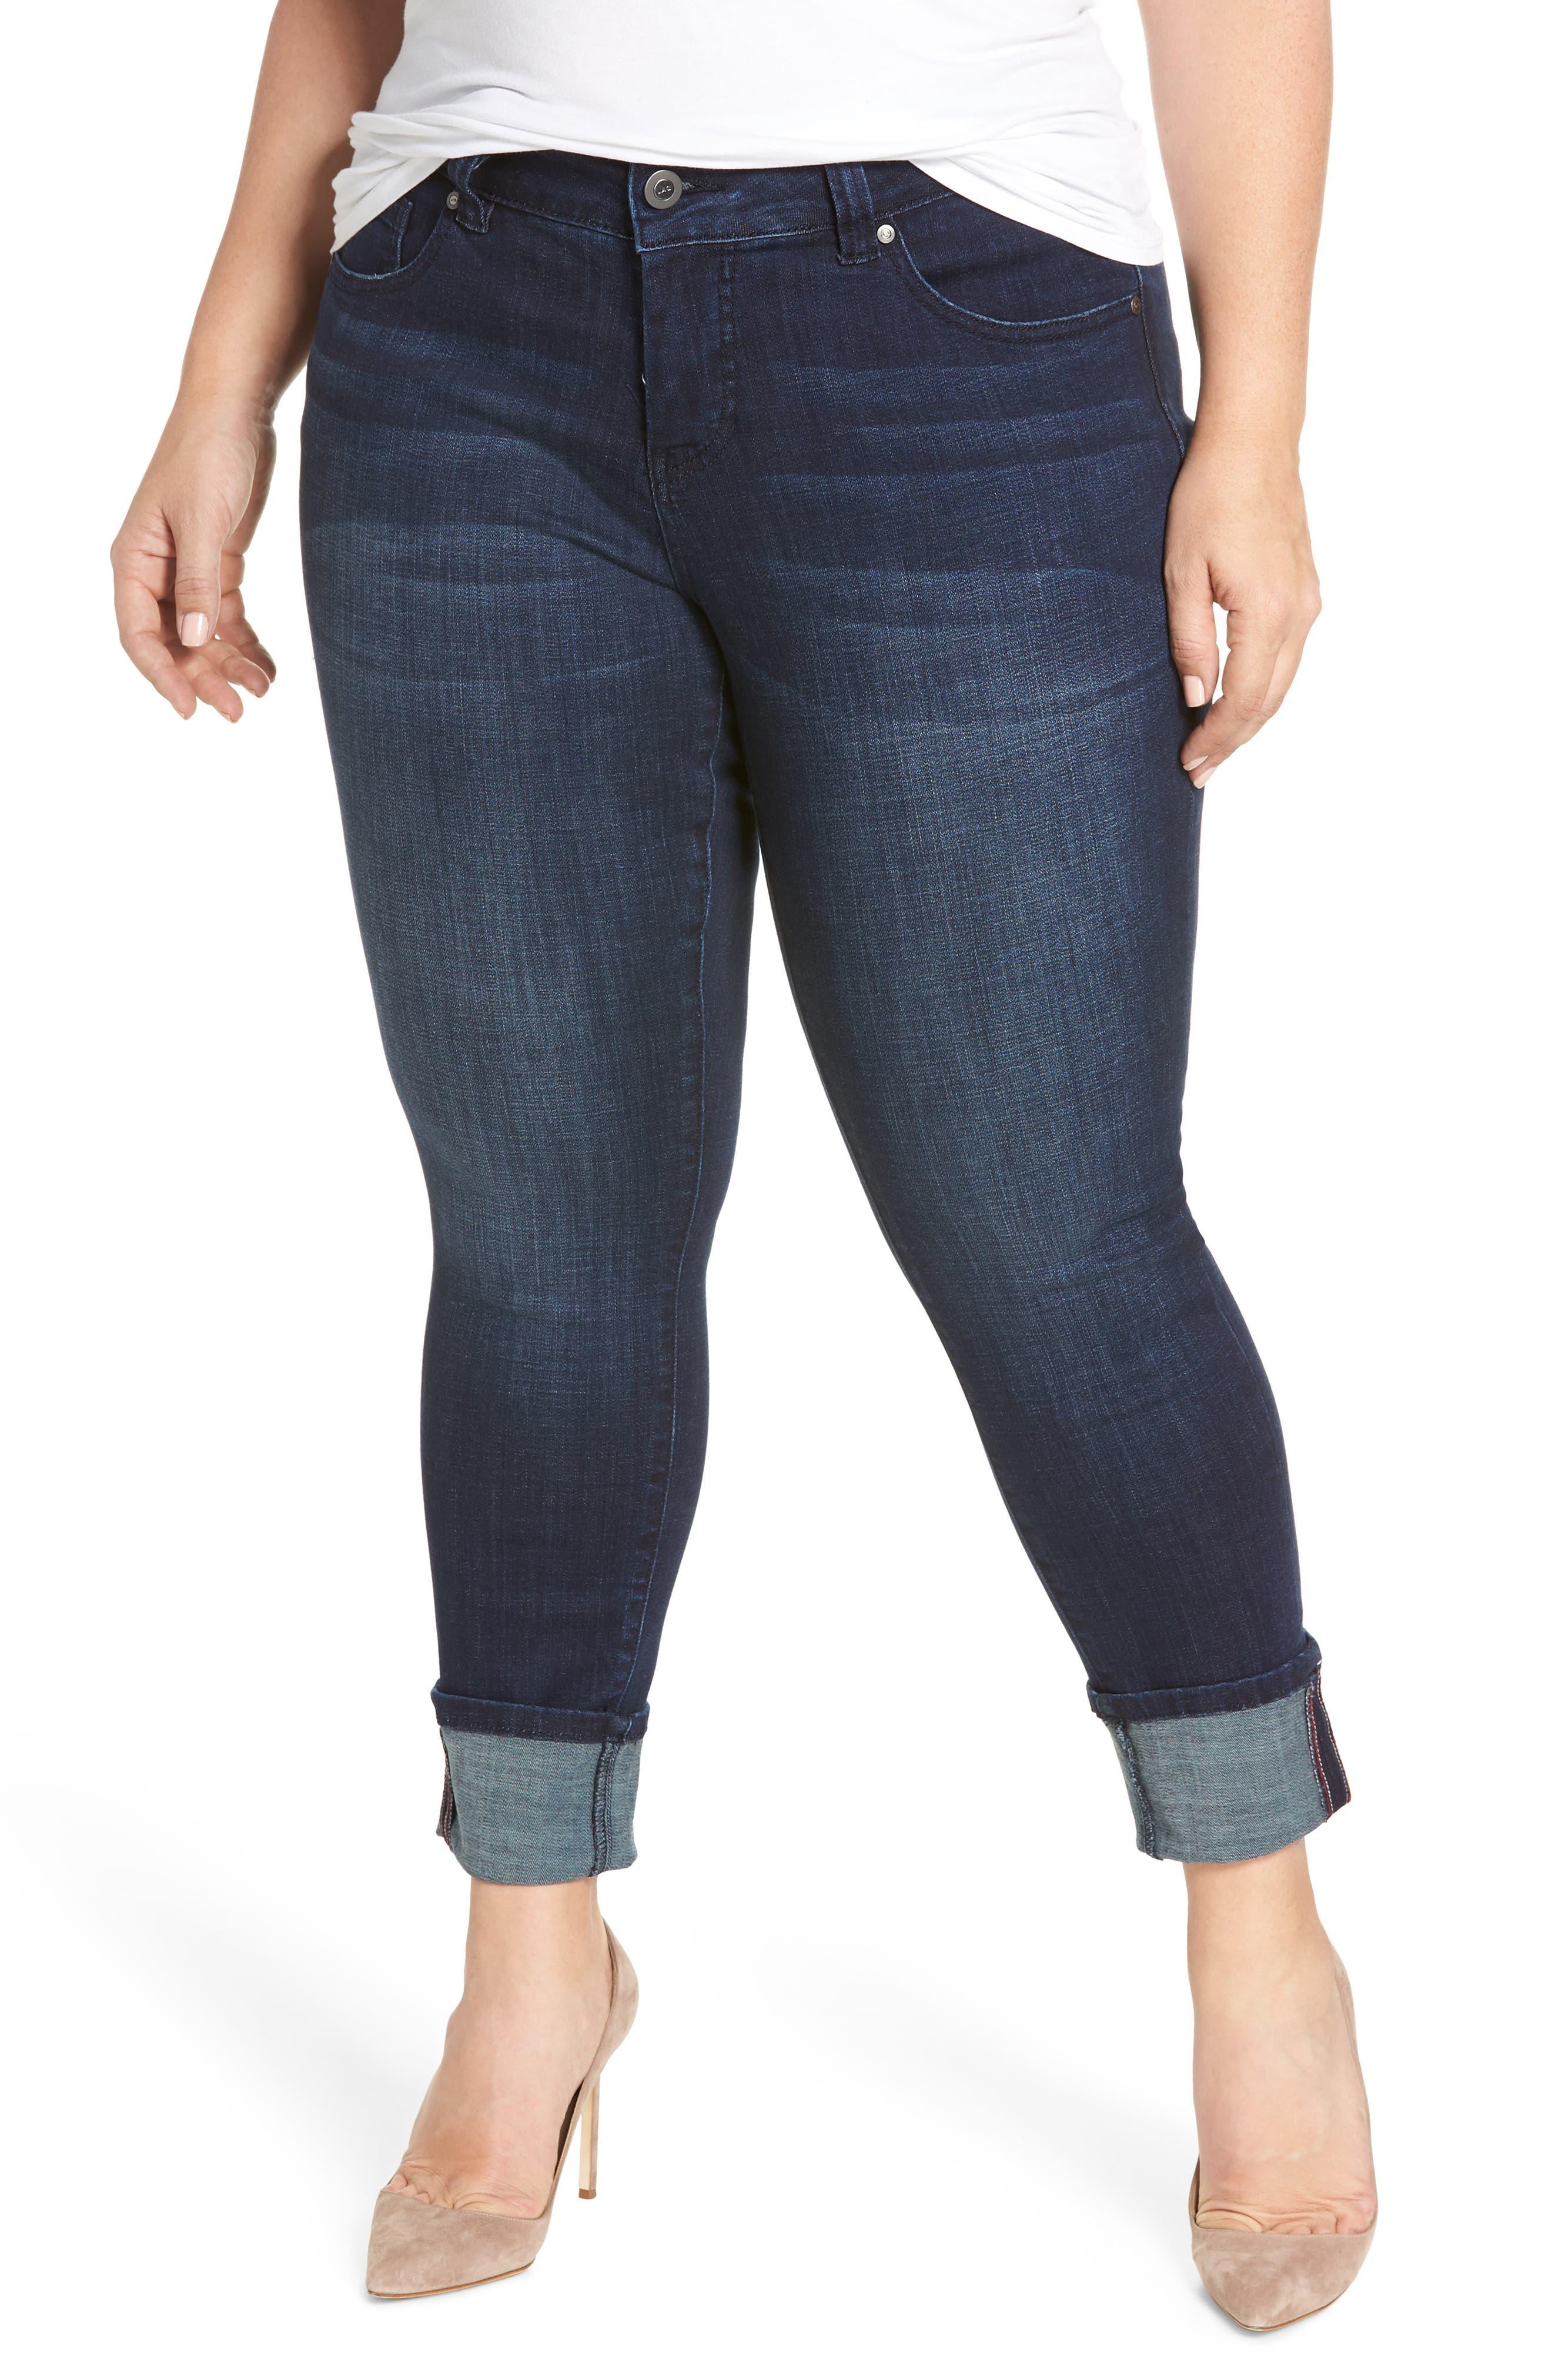 Maddie Cuff Skinny Jeans,                             Main thumbnail 1, color,                             Dark Indigo